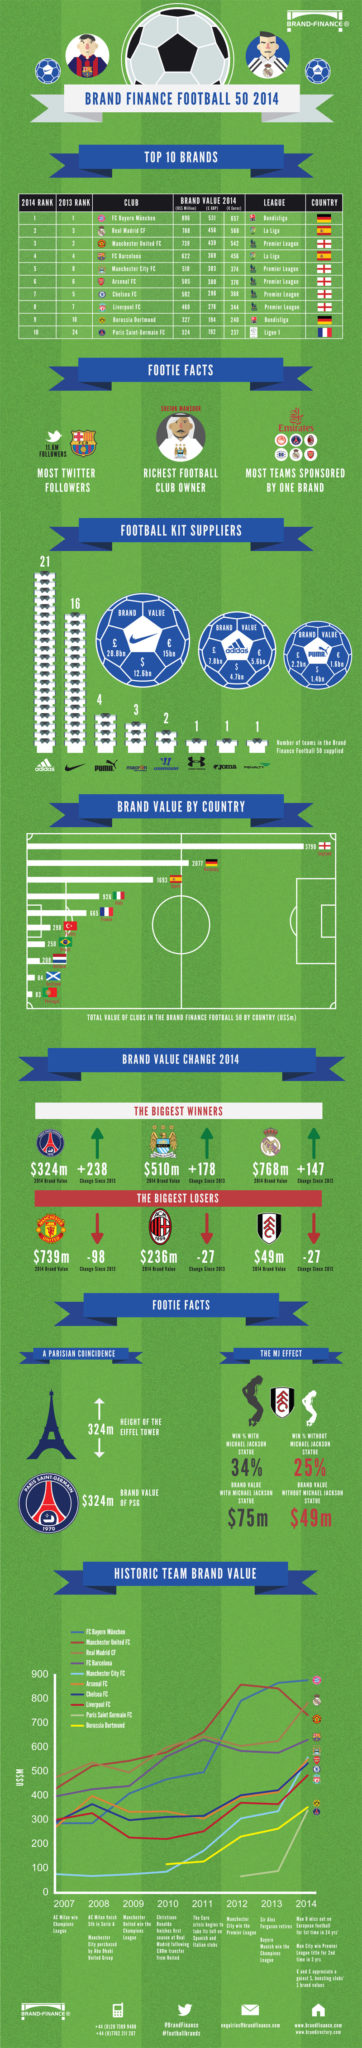 Les clubs de football les plus valorisés en tant que marque